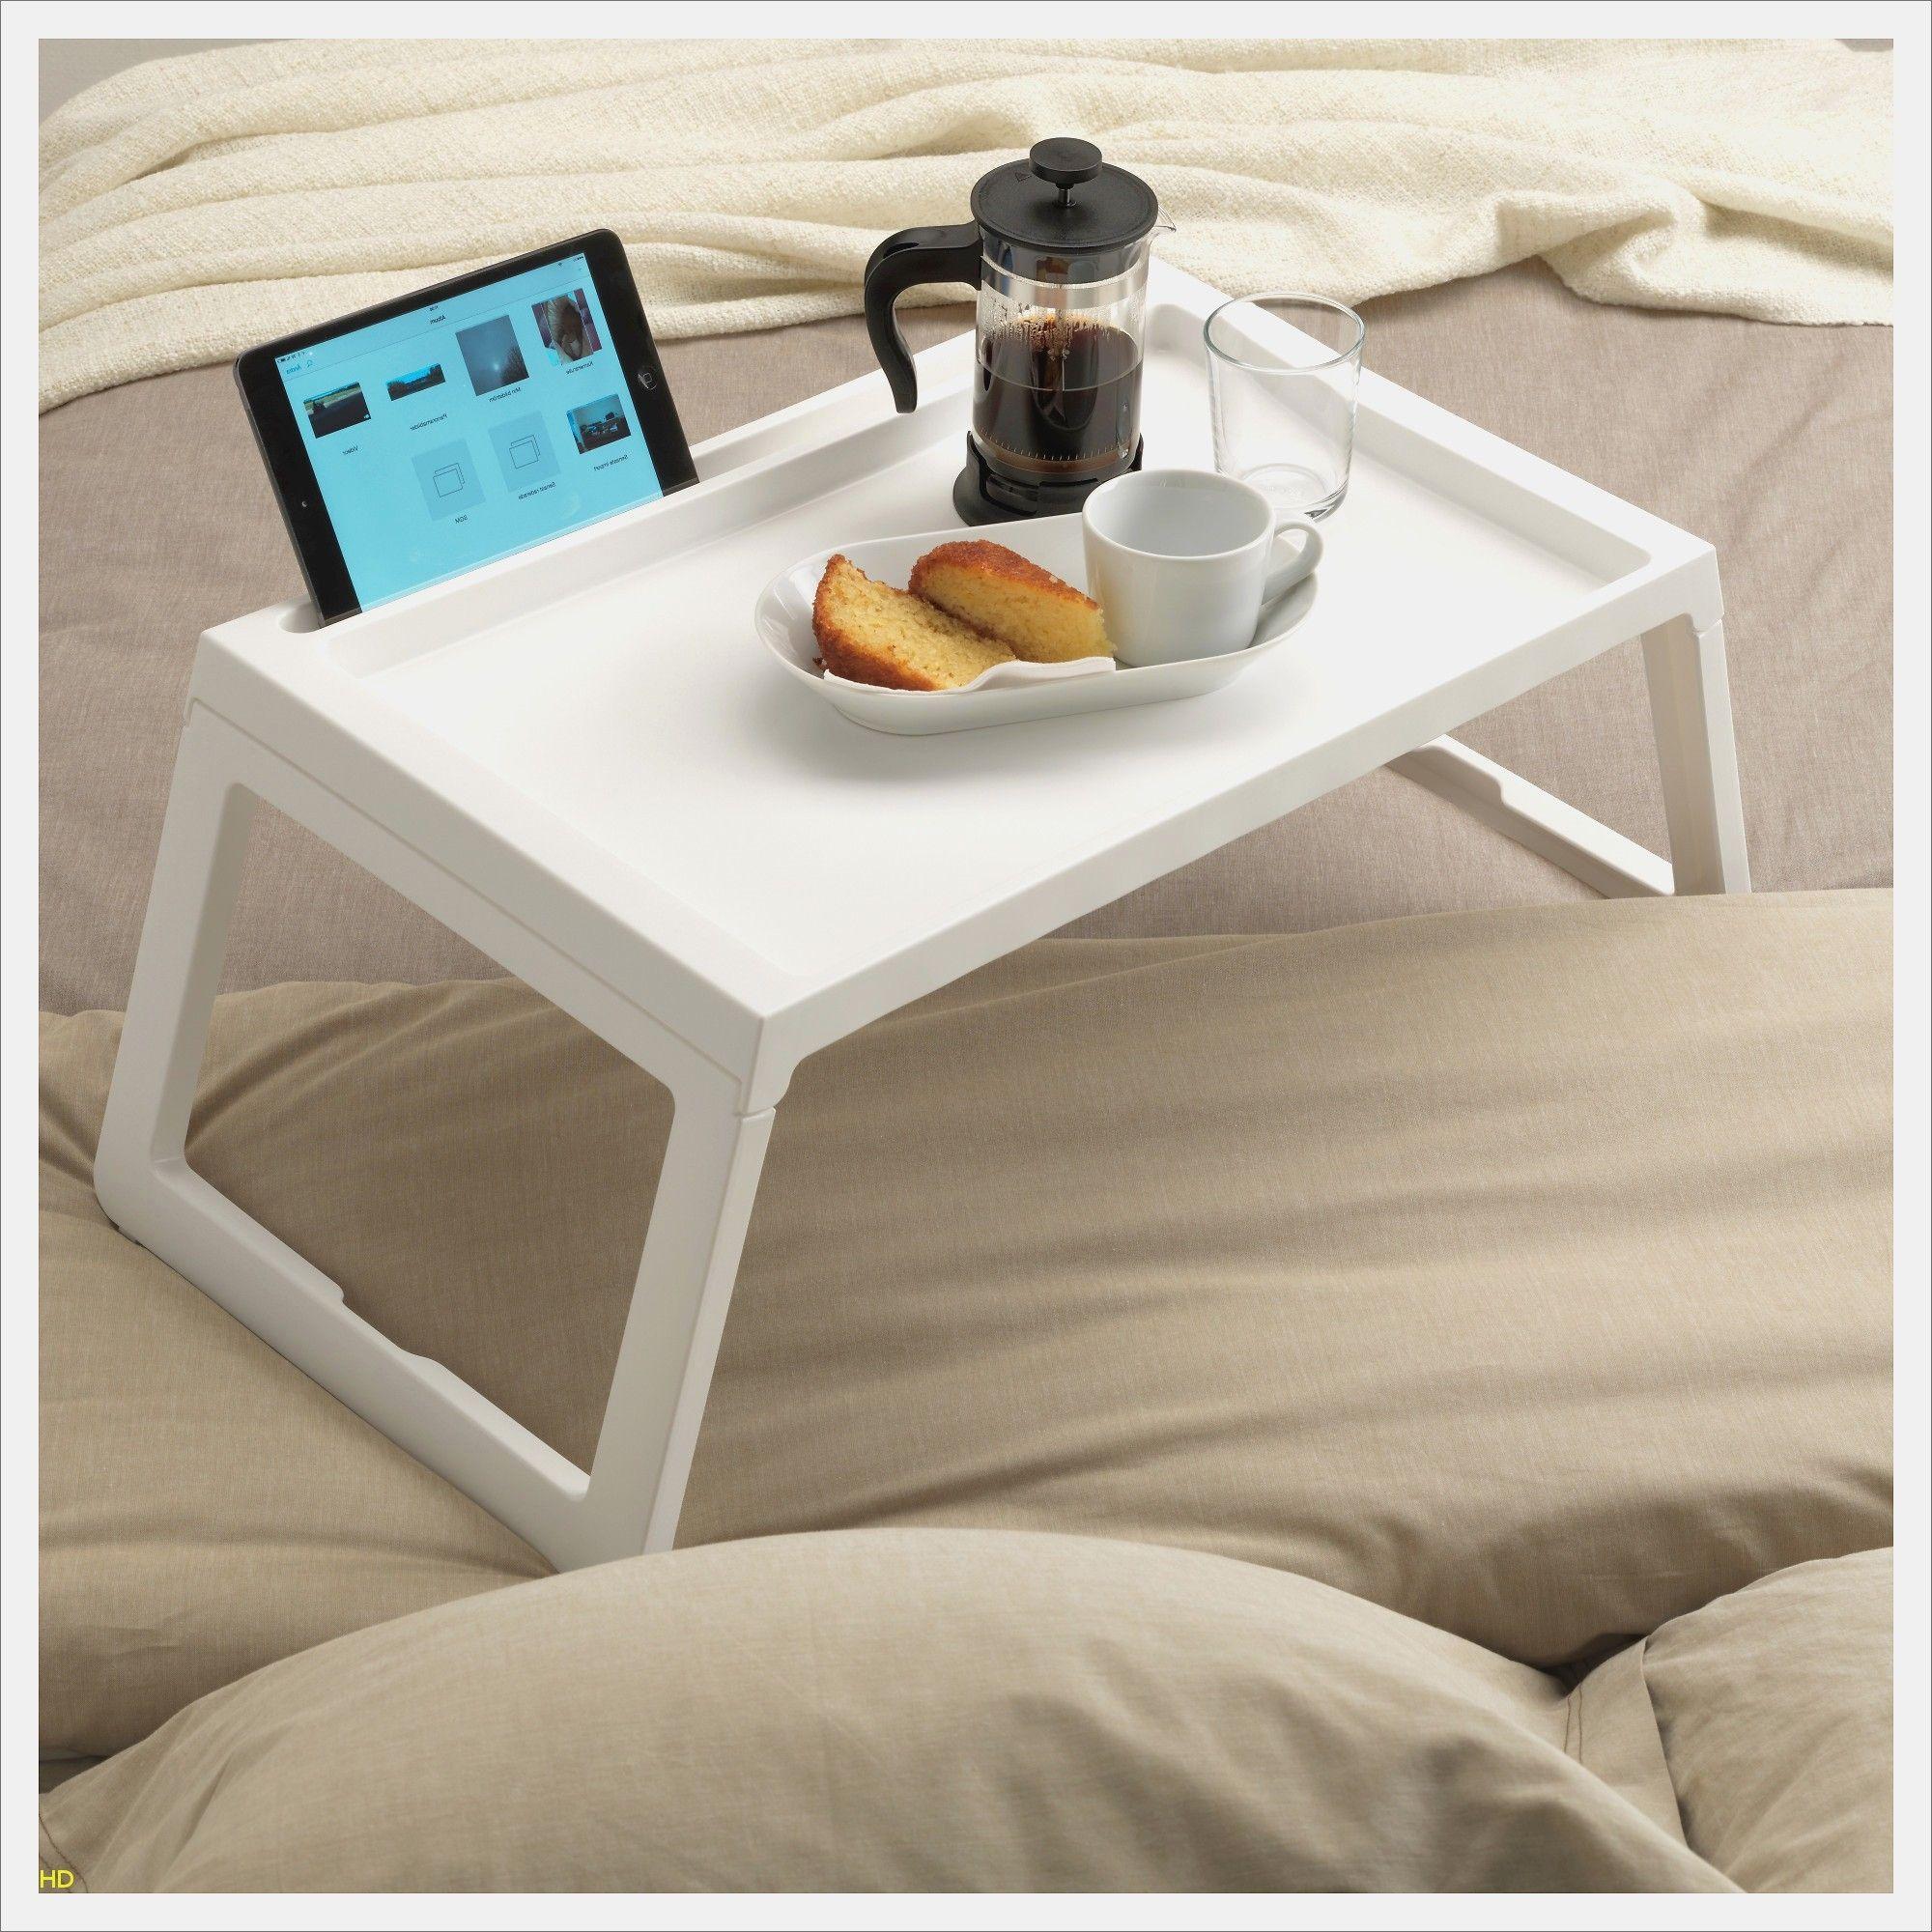 Tuyau Vidange Baignoire Bebe Universel Tuyau Vidange Baignoire Bebe Universel Bouchon Lavabo Achat Vente Pas Modern Folding Tables Coffee Table Table Design